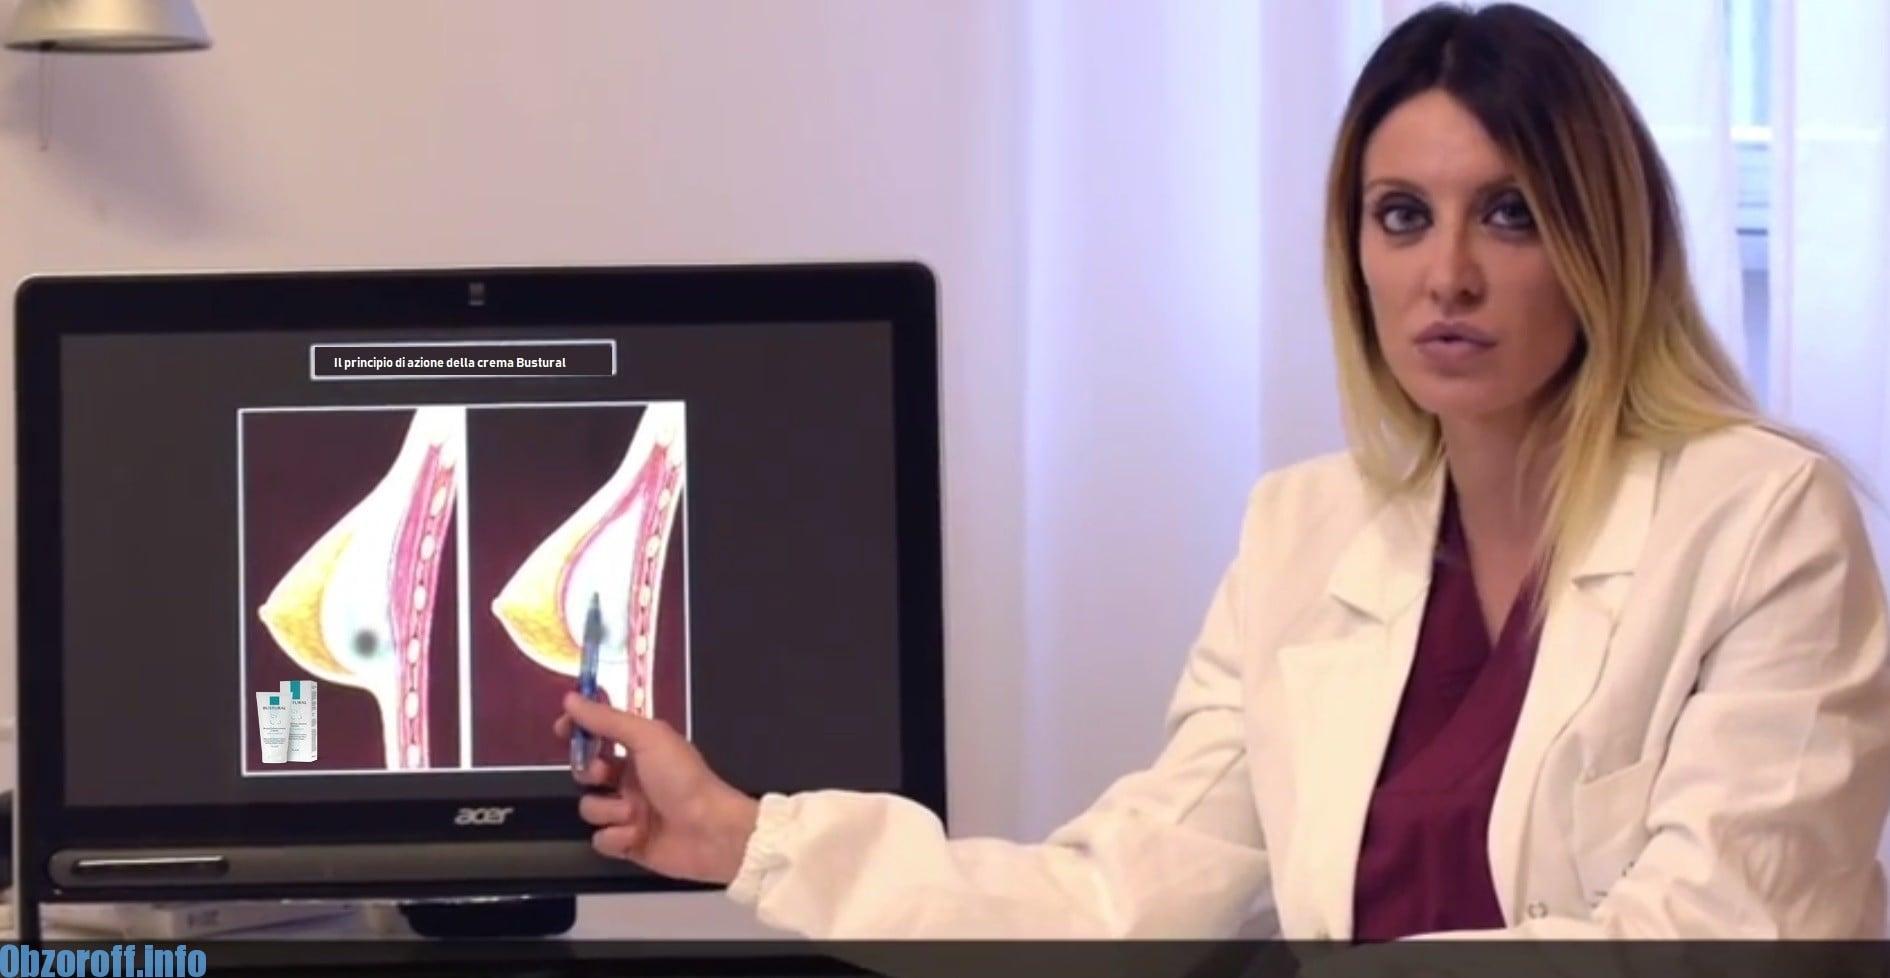 Recensioni dei medici su crema Bustural